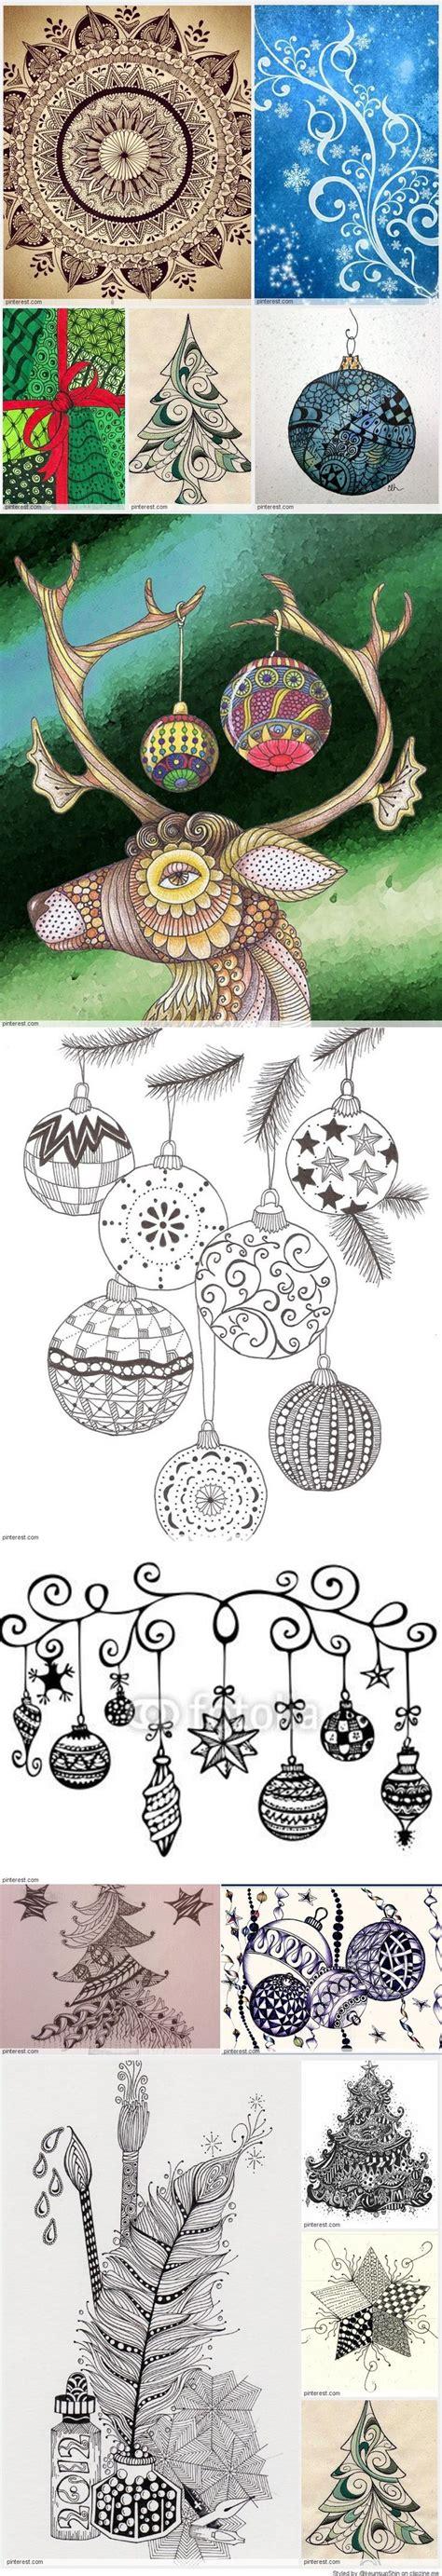 Good Christmas Pin #4: Bb44e653053ea04b0d814e8069b3af73--drawing-pics-zentangle-patterns.jpg